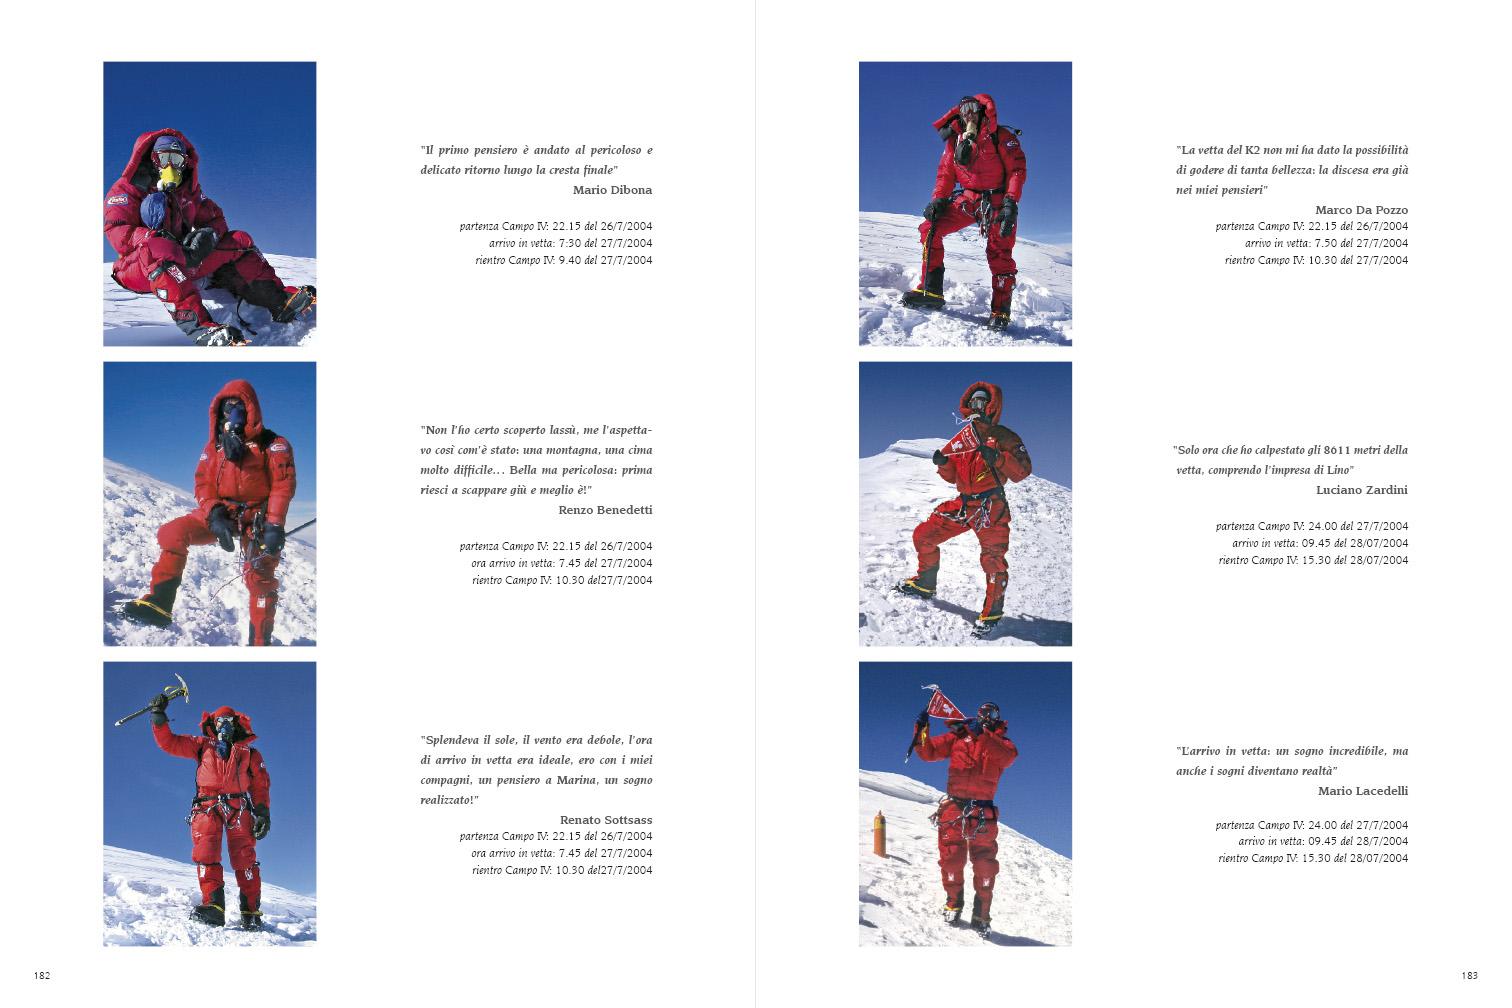 K2 EXPEDITION 1954-2004 Giuseppe Ghedina Fotografo - 093.jpg